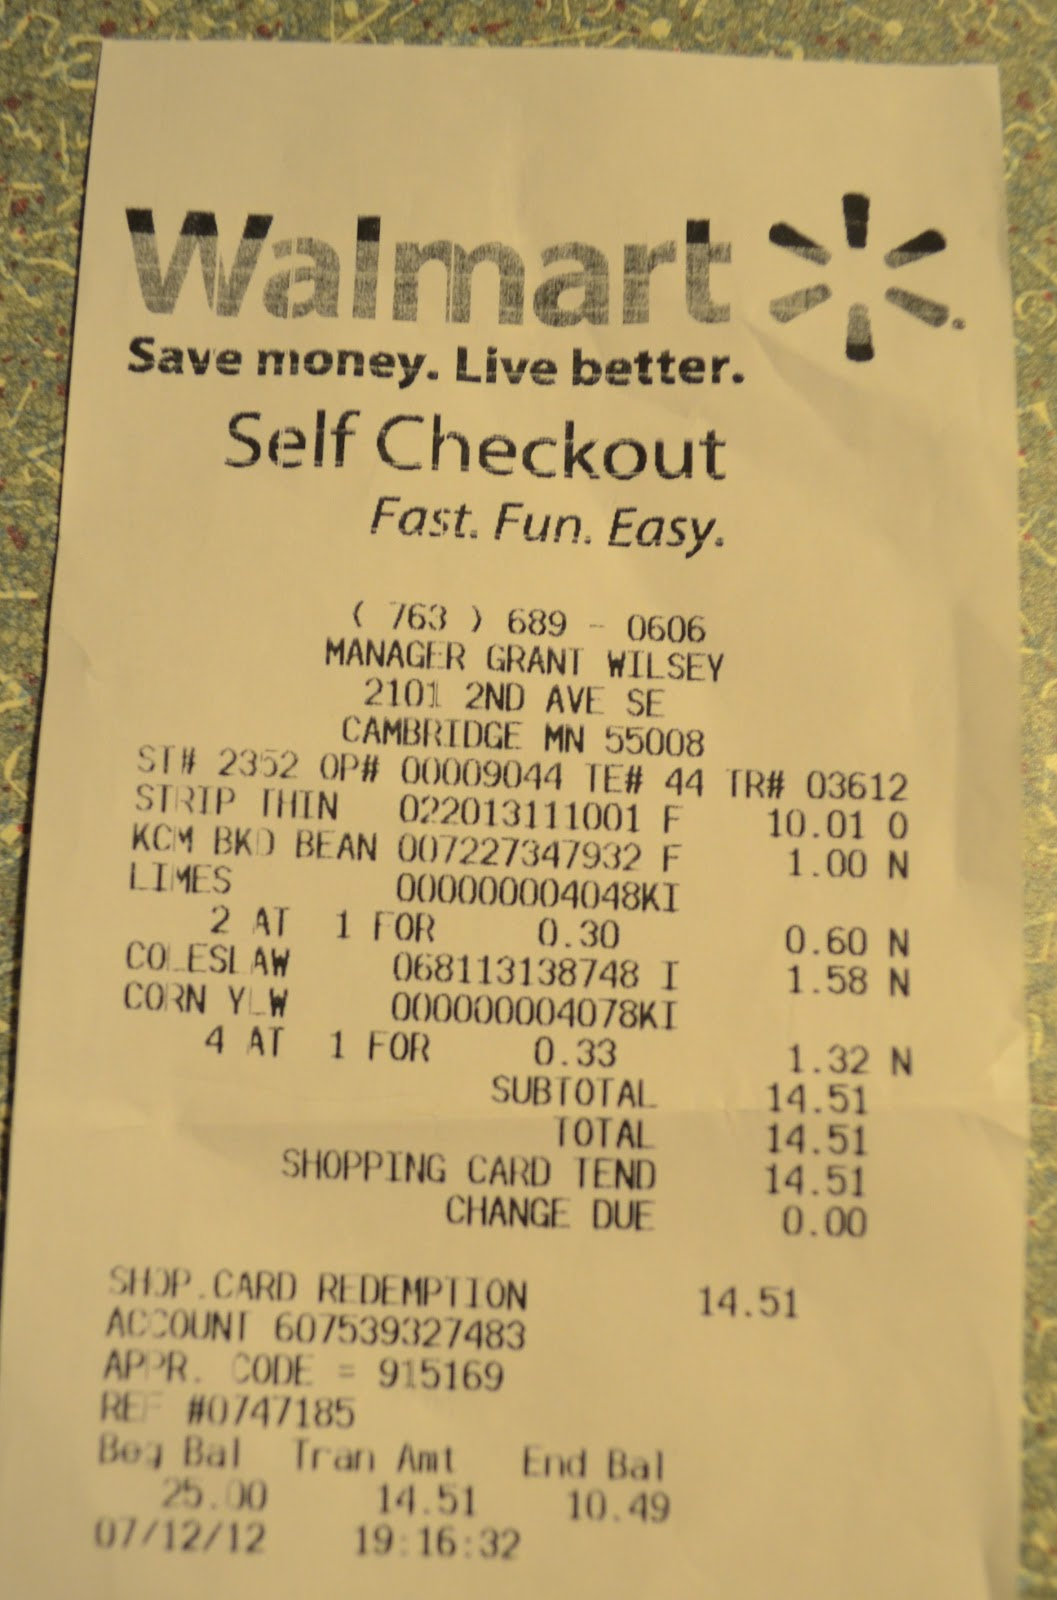 Walmart summer steak bbq on a budget challenge 25 walmart gift save i received a 25 walmart gift card 1betcityfo Choice Image